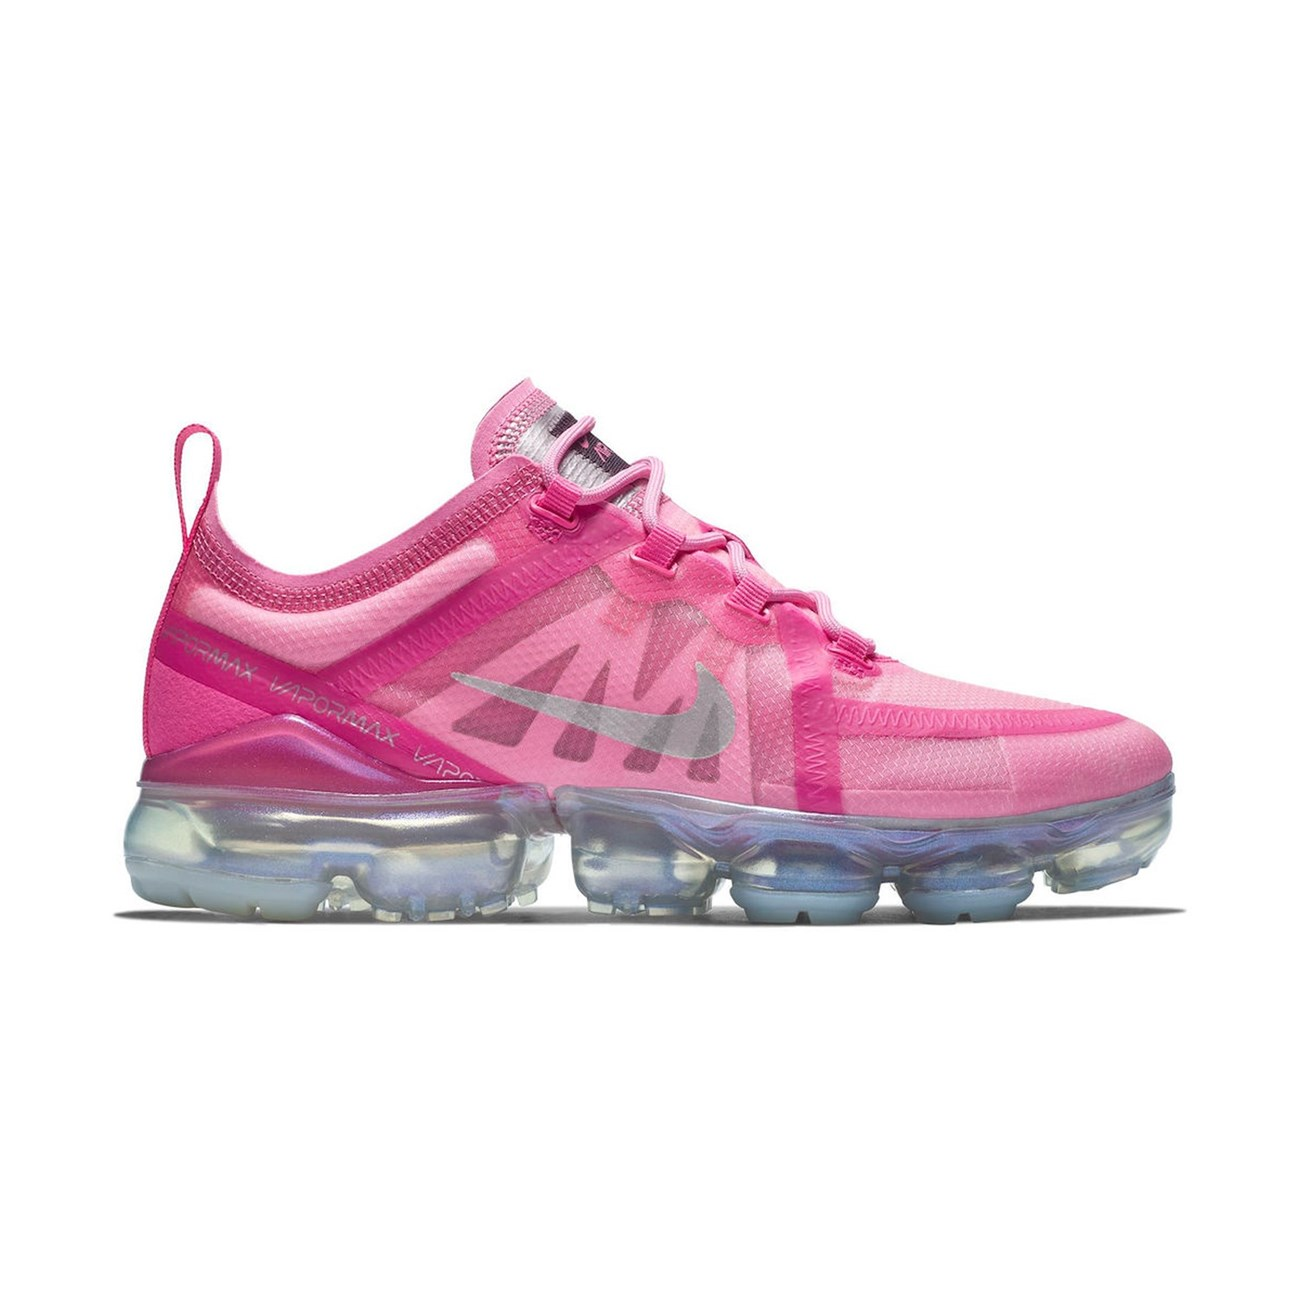 a8de6da5533 NIKE AIR VAPORMAX 2019 W < Παπούτσια για Τρέξιμο   INTERSPORT